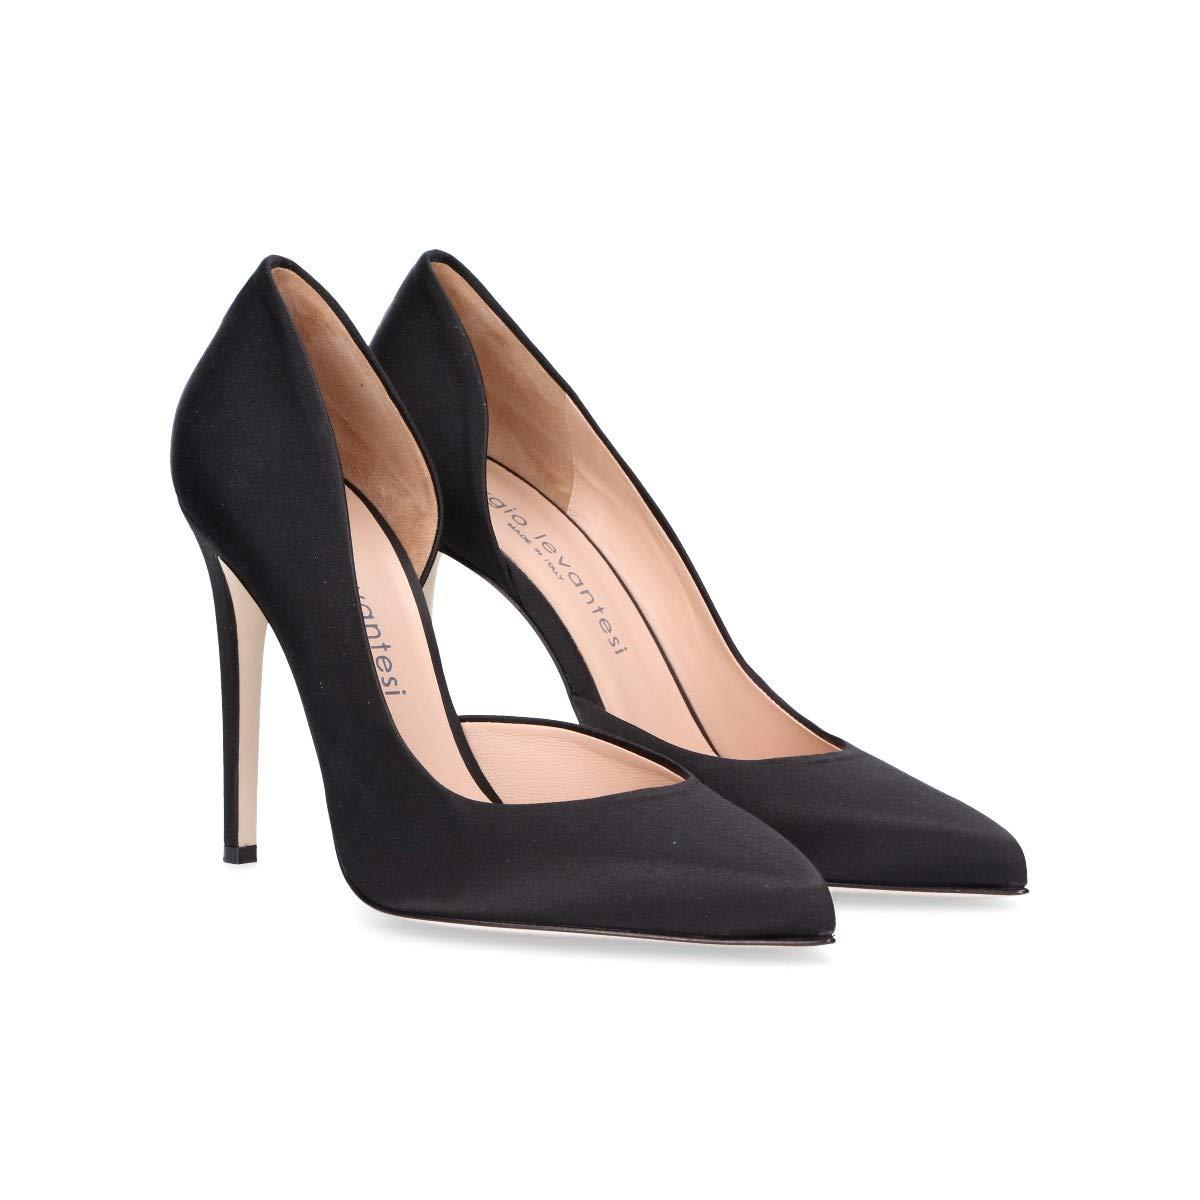 SERGIO LEVANTESI Femme MYKABLACK Noir Tissu Tissu Noir EscarpinsB07G4K8B6GParent 8387ee